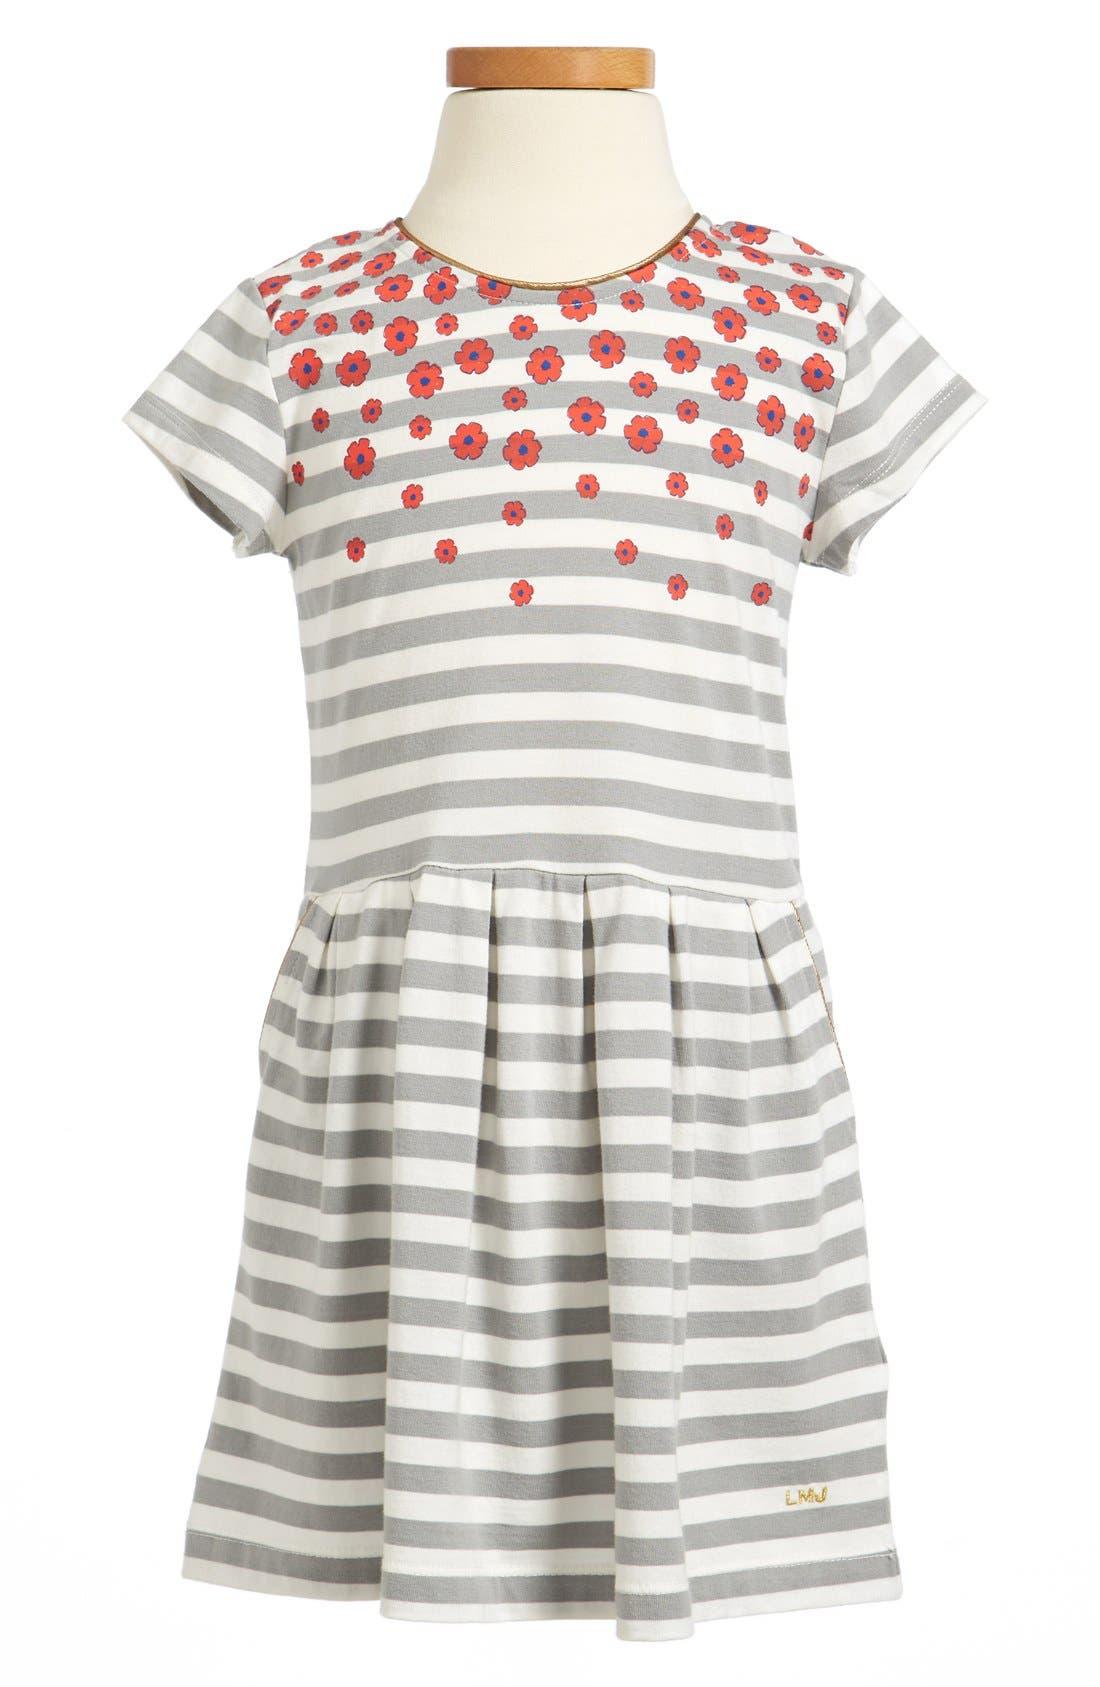 Main Image - LITTLE MARC JACOBS Stripe Floral Jersey Dress (Little Girls & Big Girls)